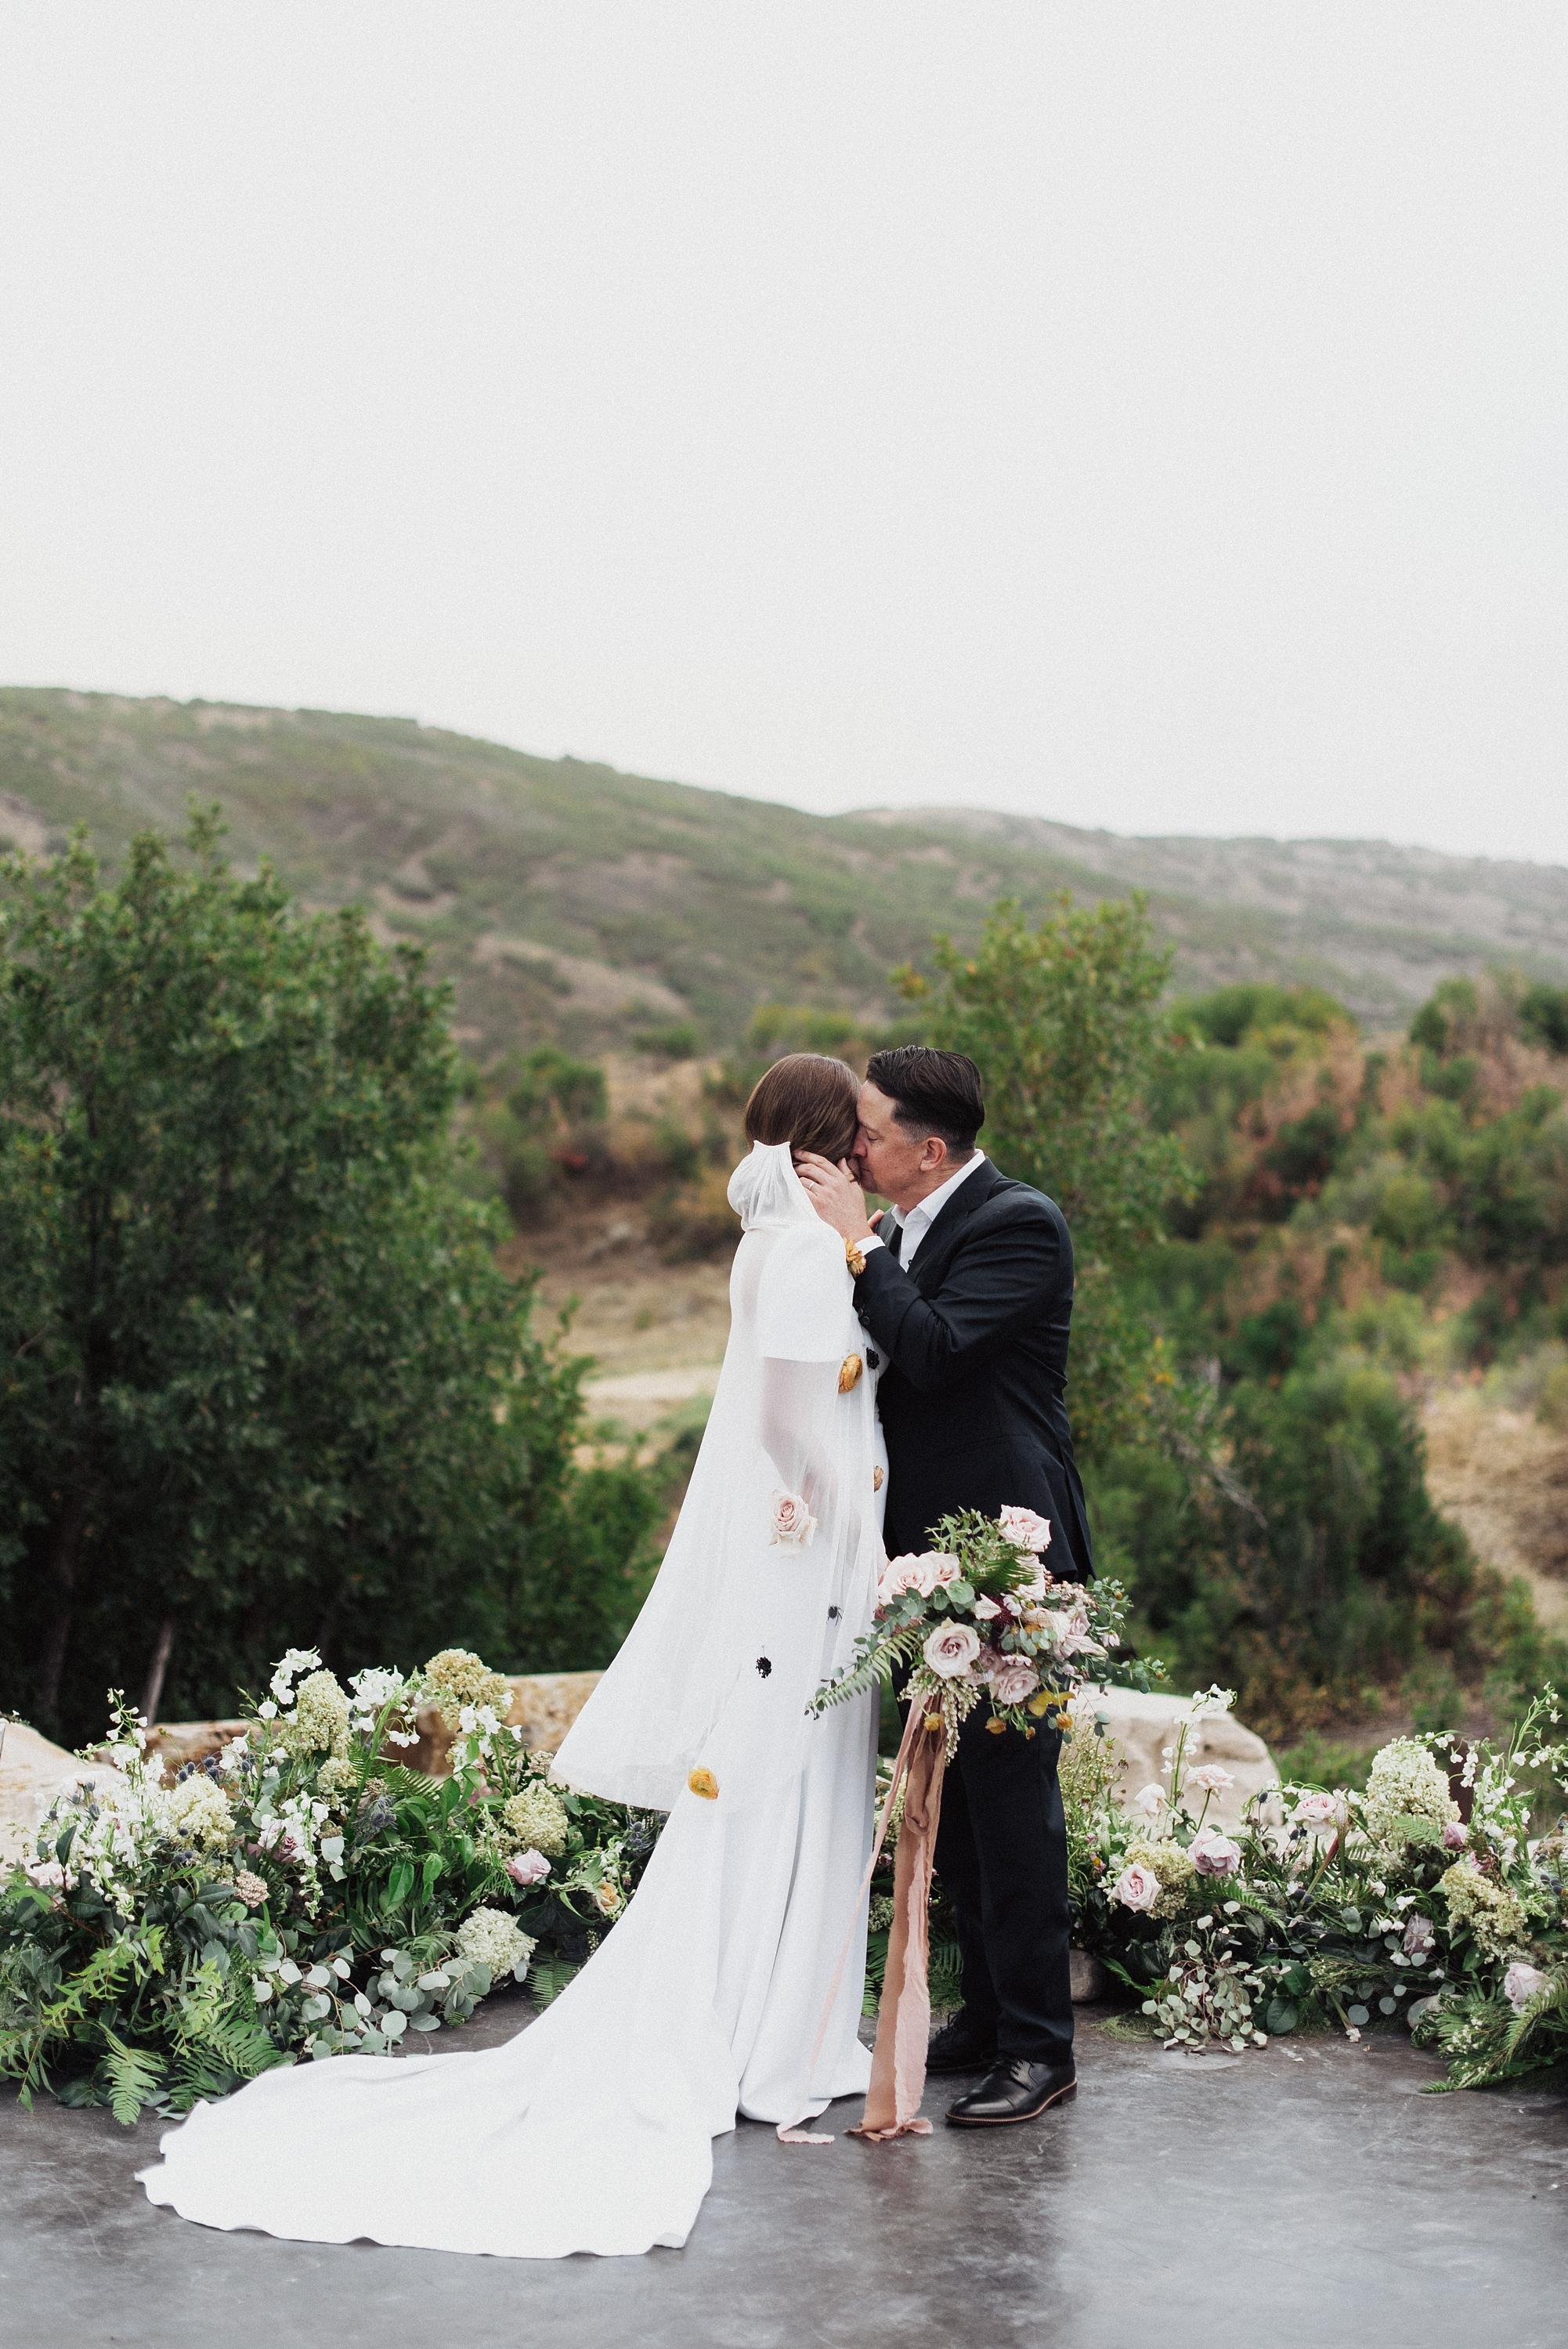 edenstraderphoto-weddingphotographer_1504.jpg